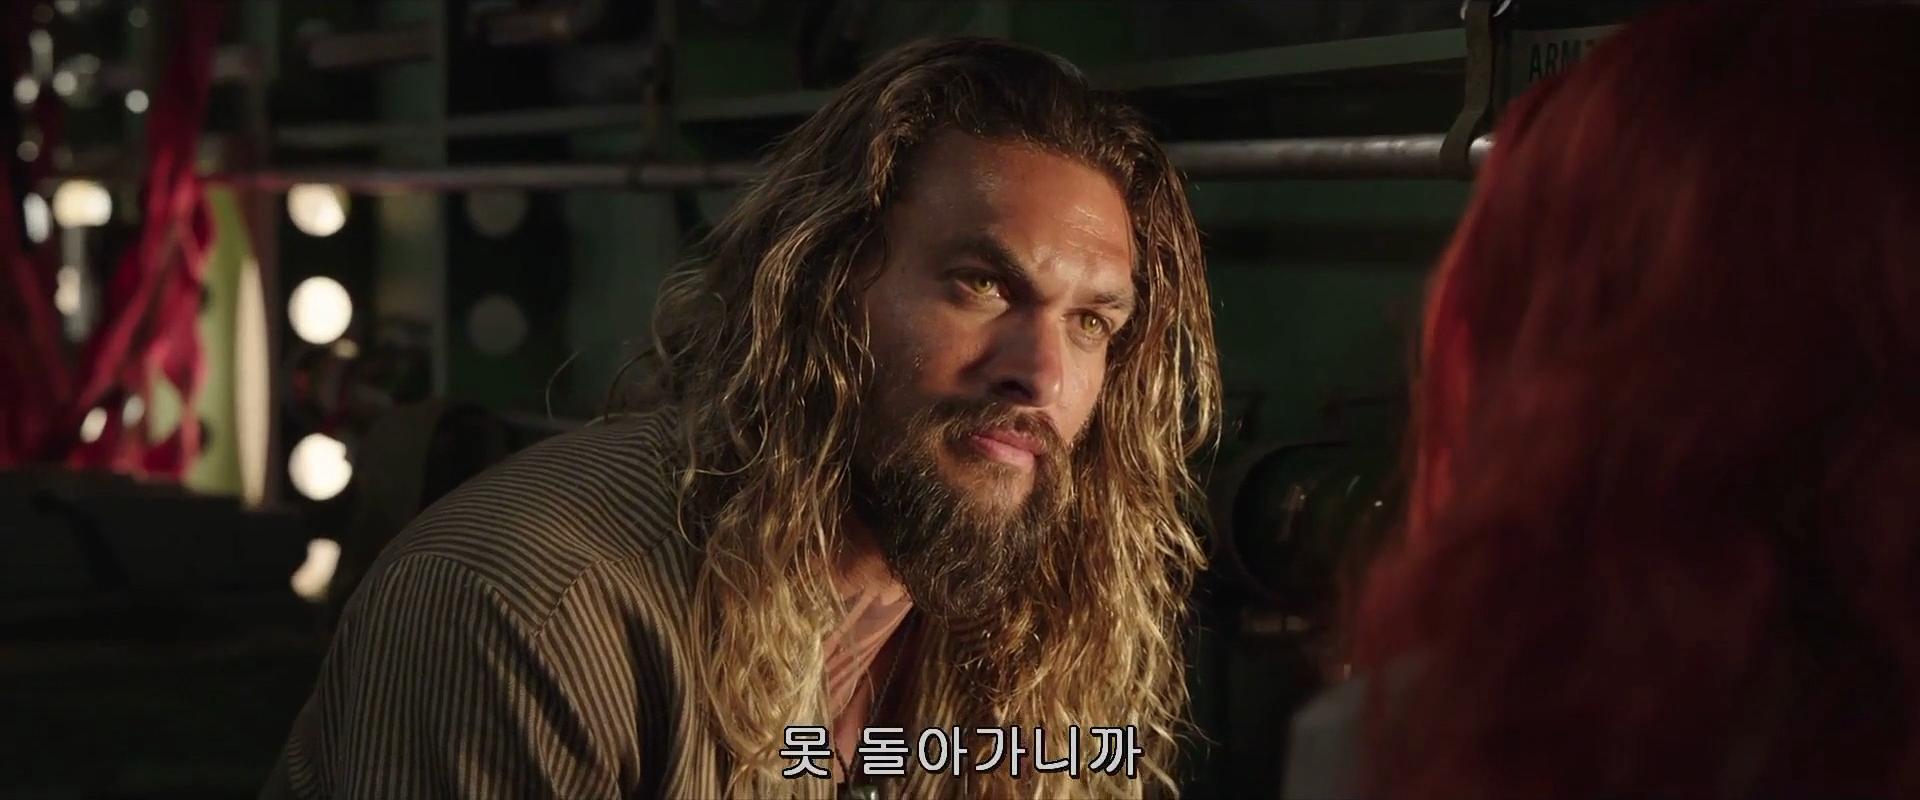 Aquaman.2018.1080p.KORSUB.WEBRip.1080p.x264.-STUTTERSHIT.mkv_20190126_183420.628.png